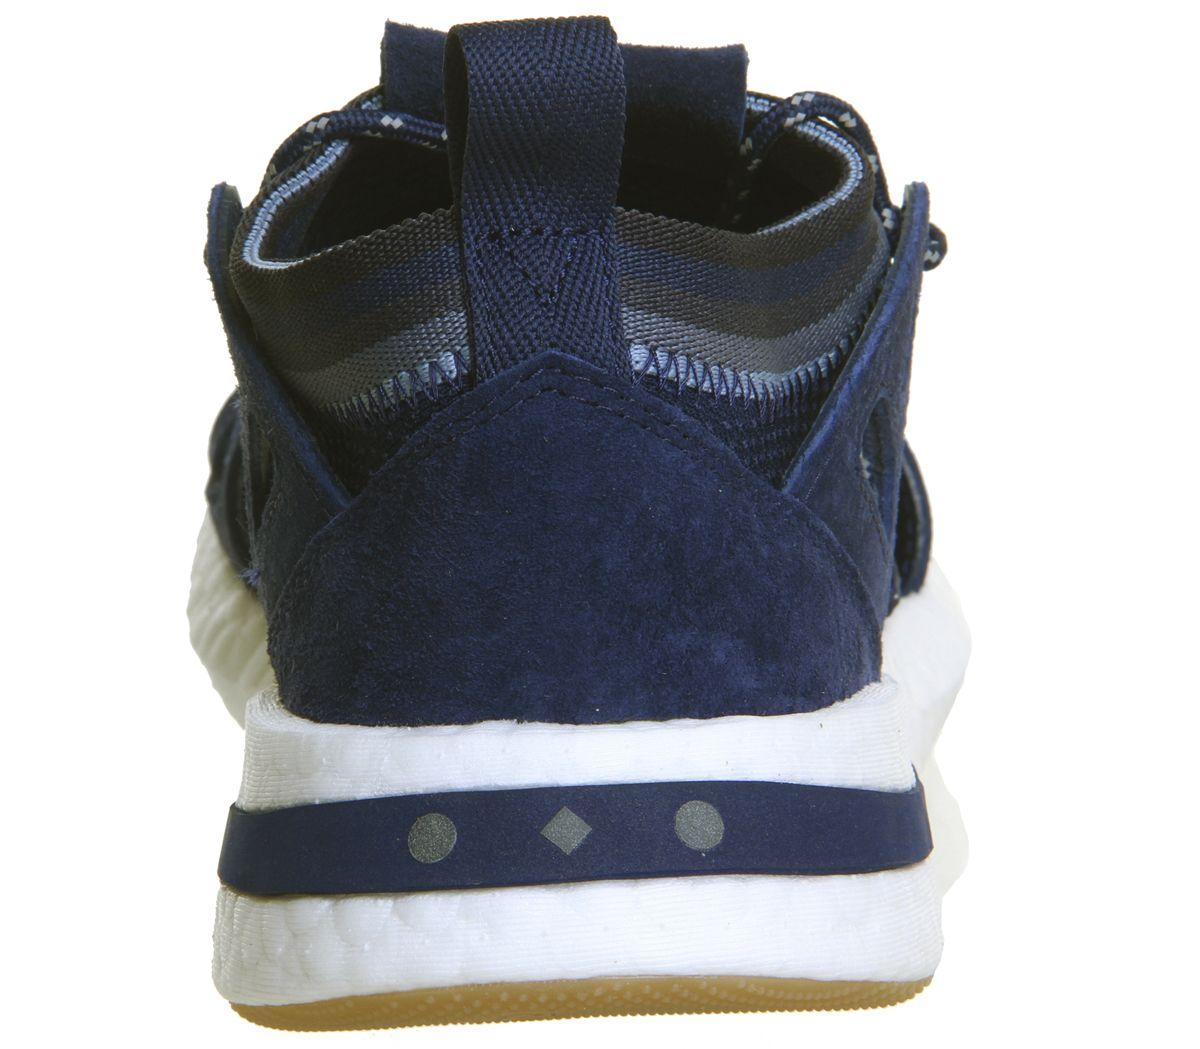 Mujer-Adidas-Arkyn-Zapatillas-Universo-Azul-Oscuro-Goma-Zapatillas-Deportivas miniatura 8